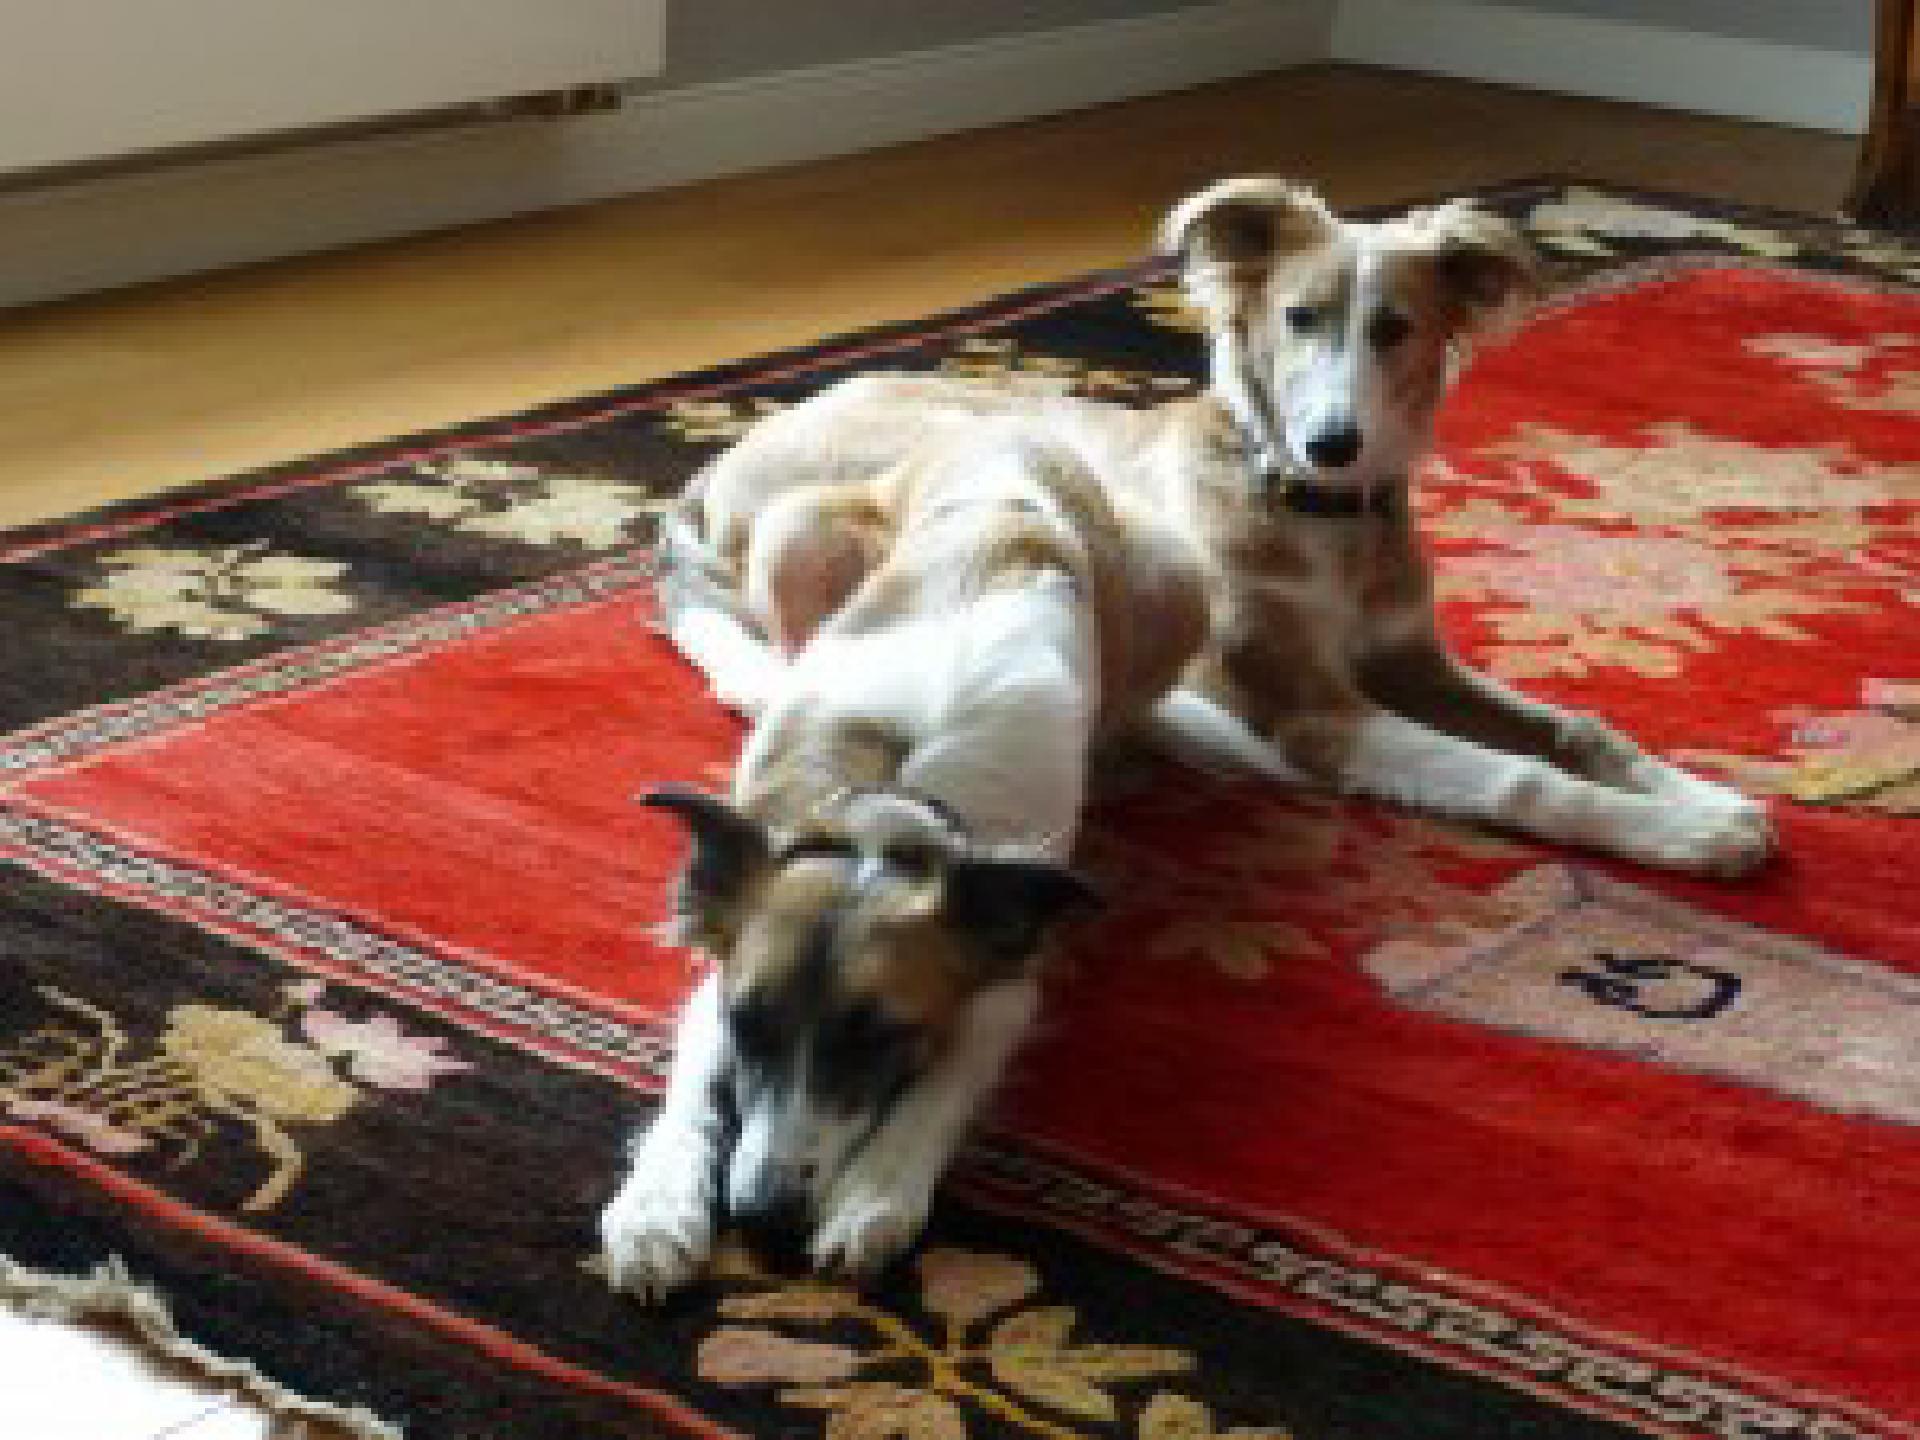 Salonhunde